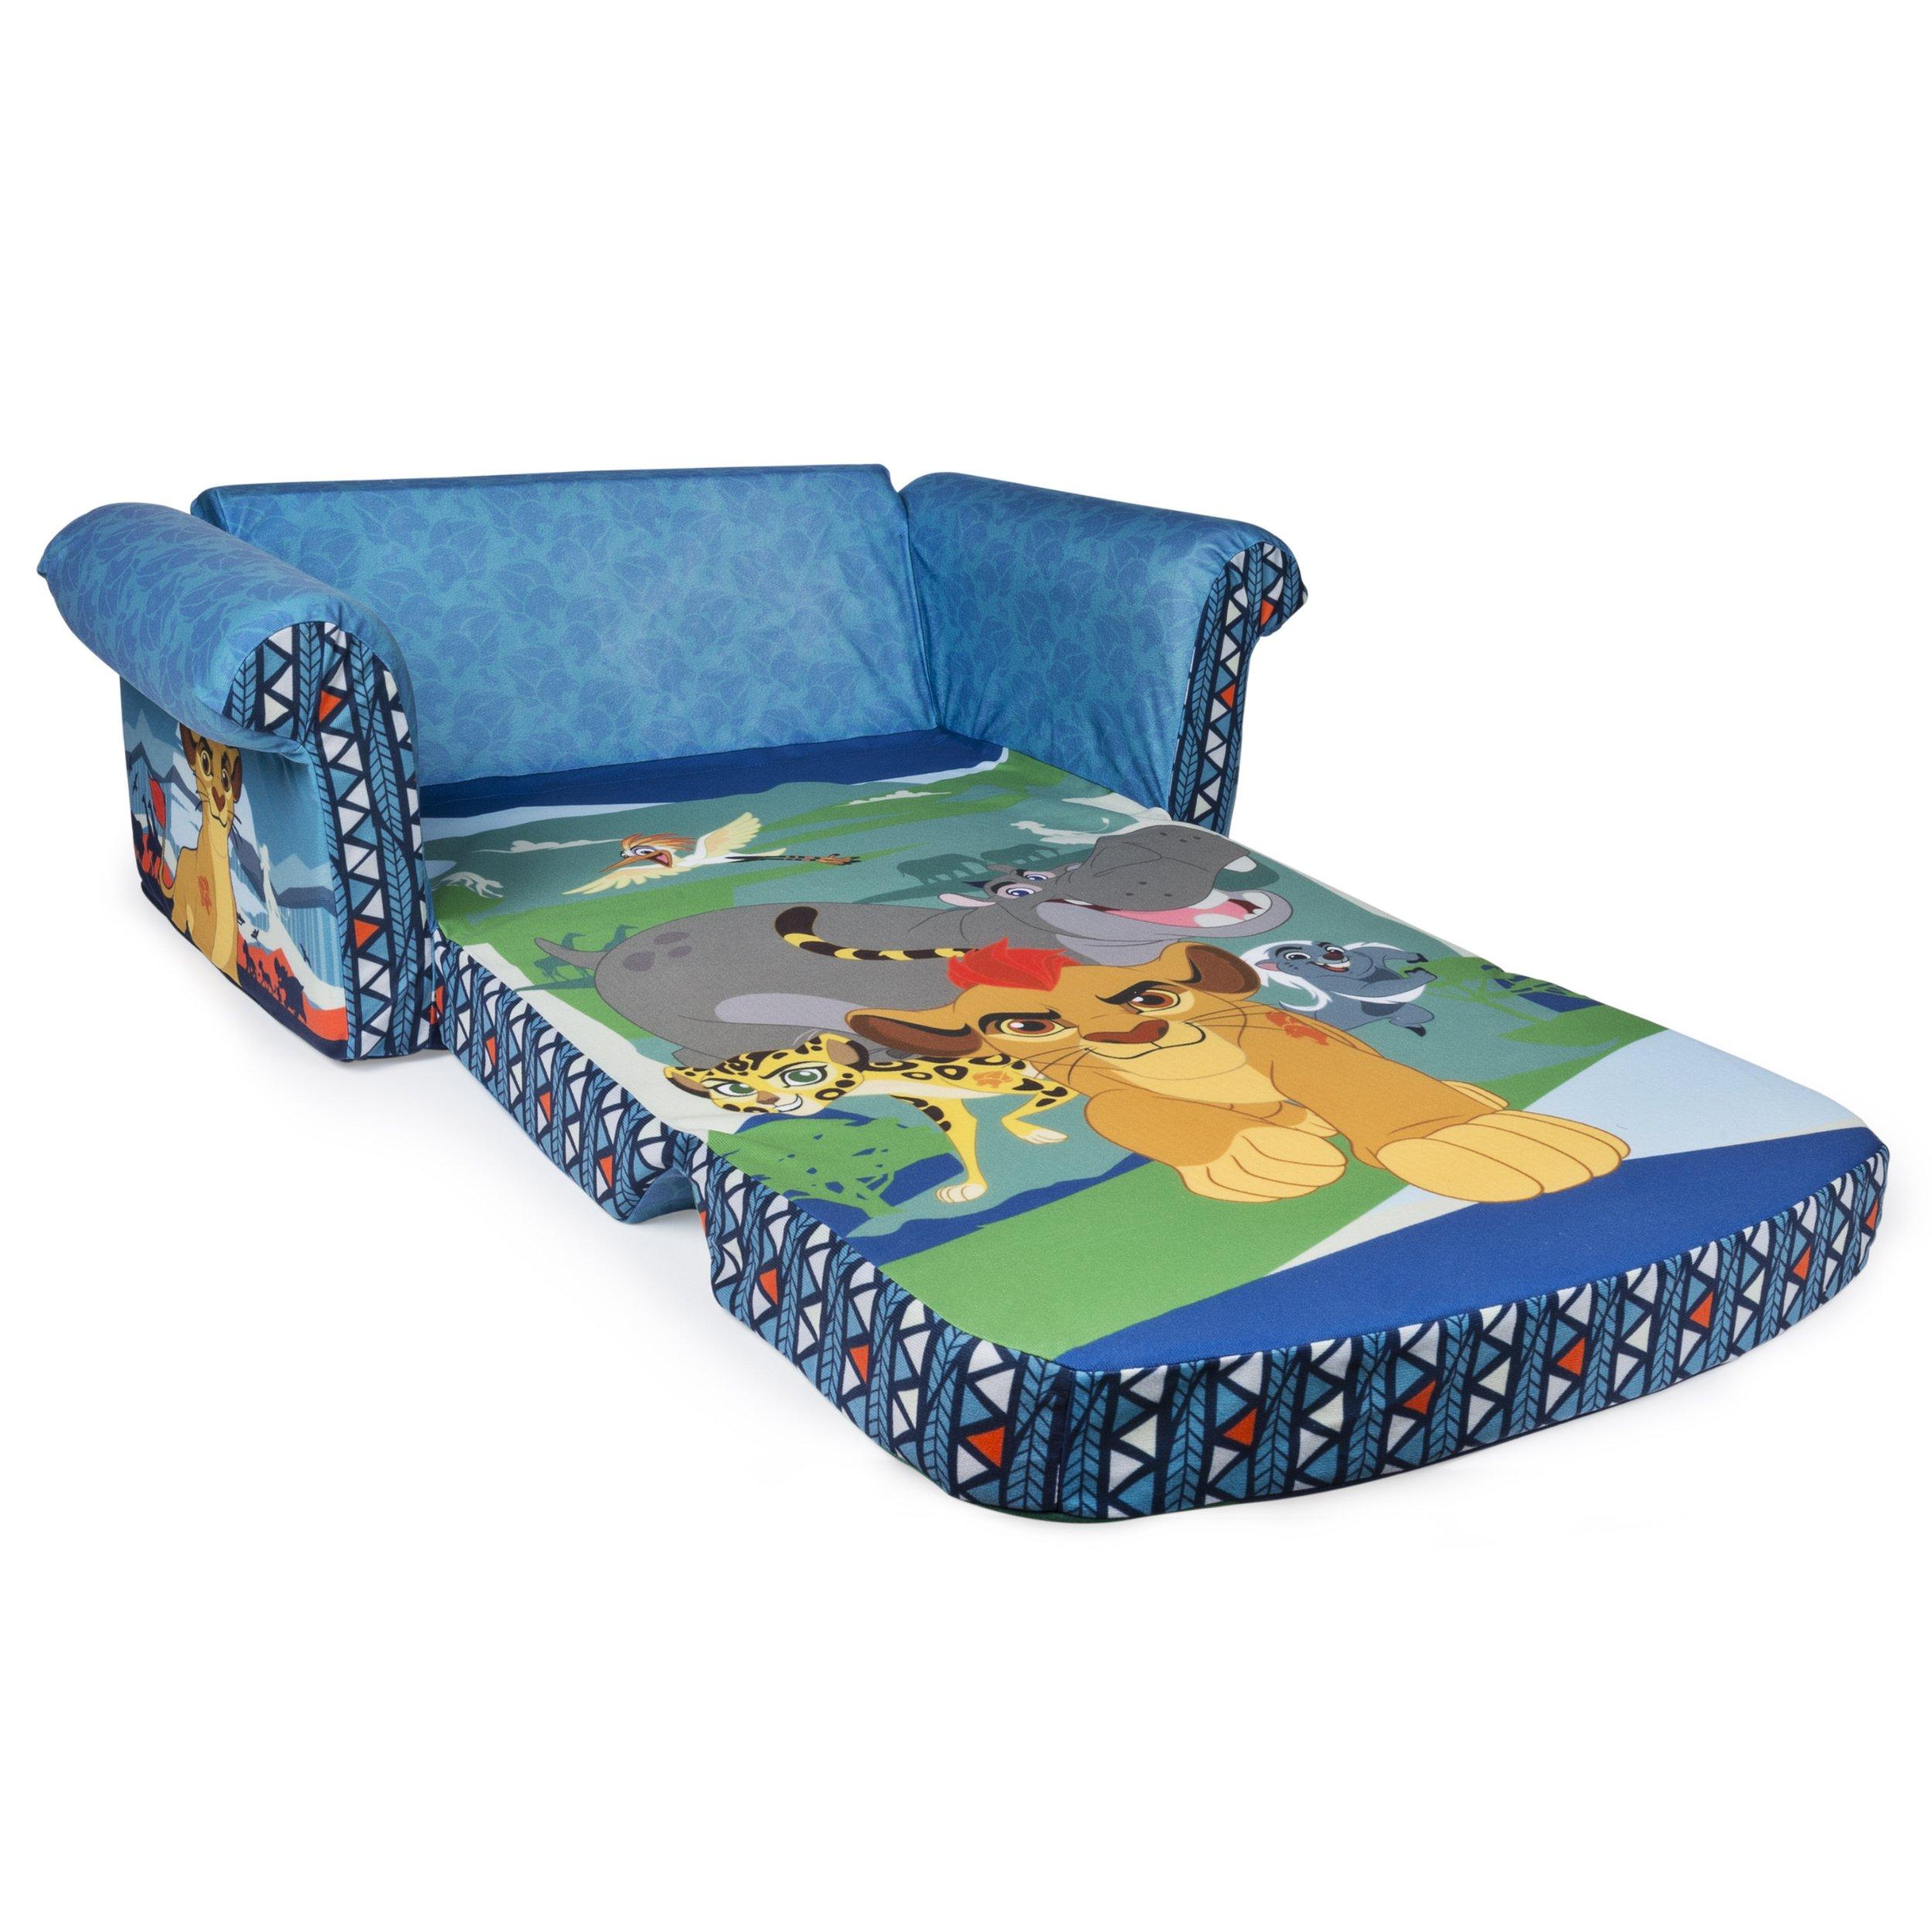 Marshmallow Furniture, Children's 2 in 1 Flip Open Foam Sofa, Disney Junior The Lion Guard, by Spin Master